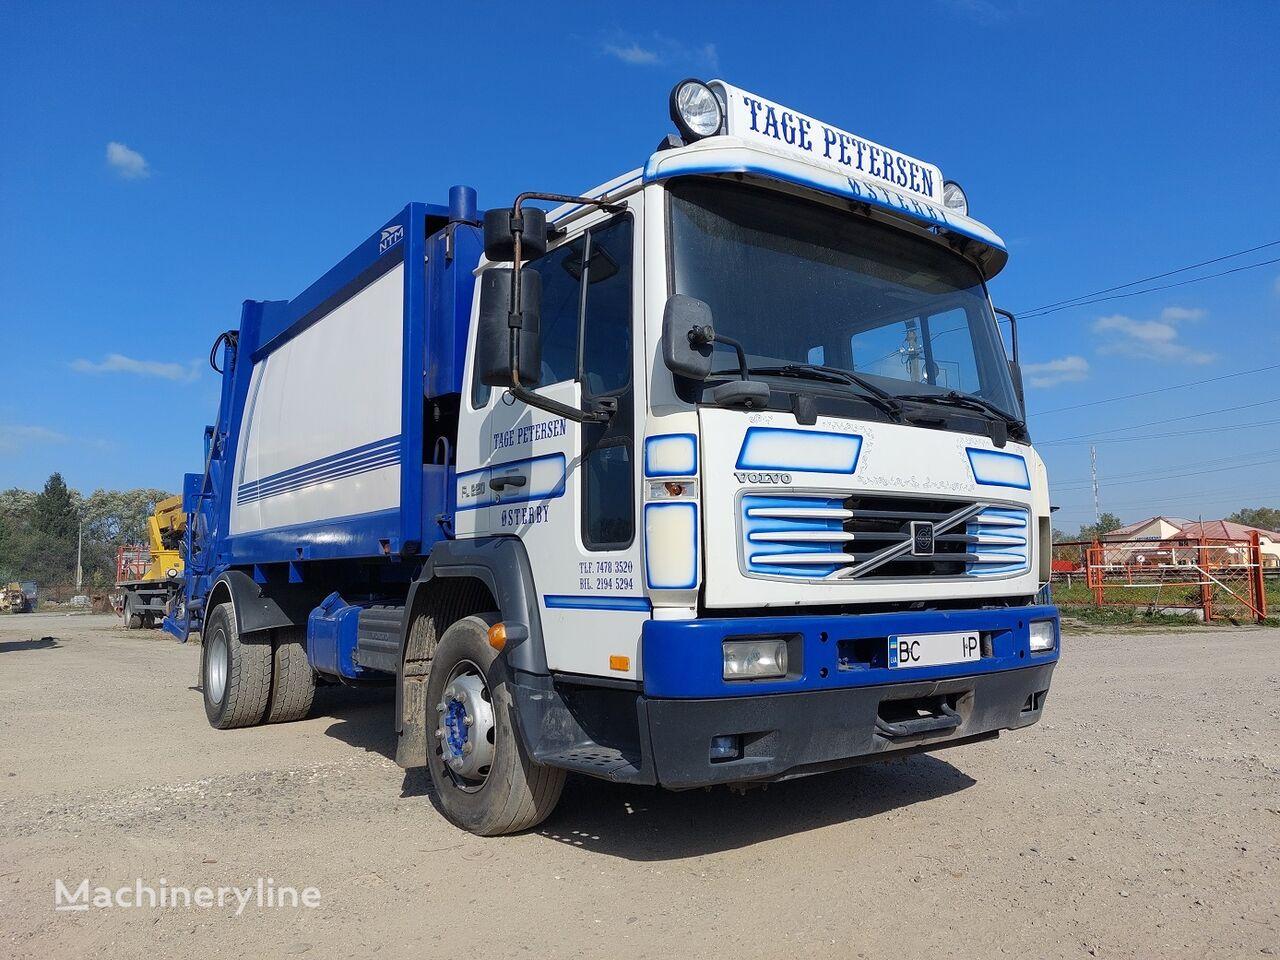 camion poubelle VOLVO FL 220 Bunker – finskiy NTM-11 m3 Presue – 6:1 Vidminniy stan!